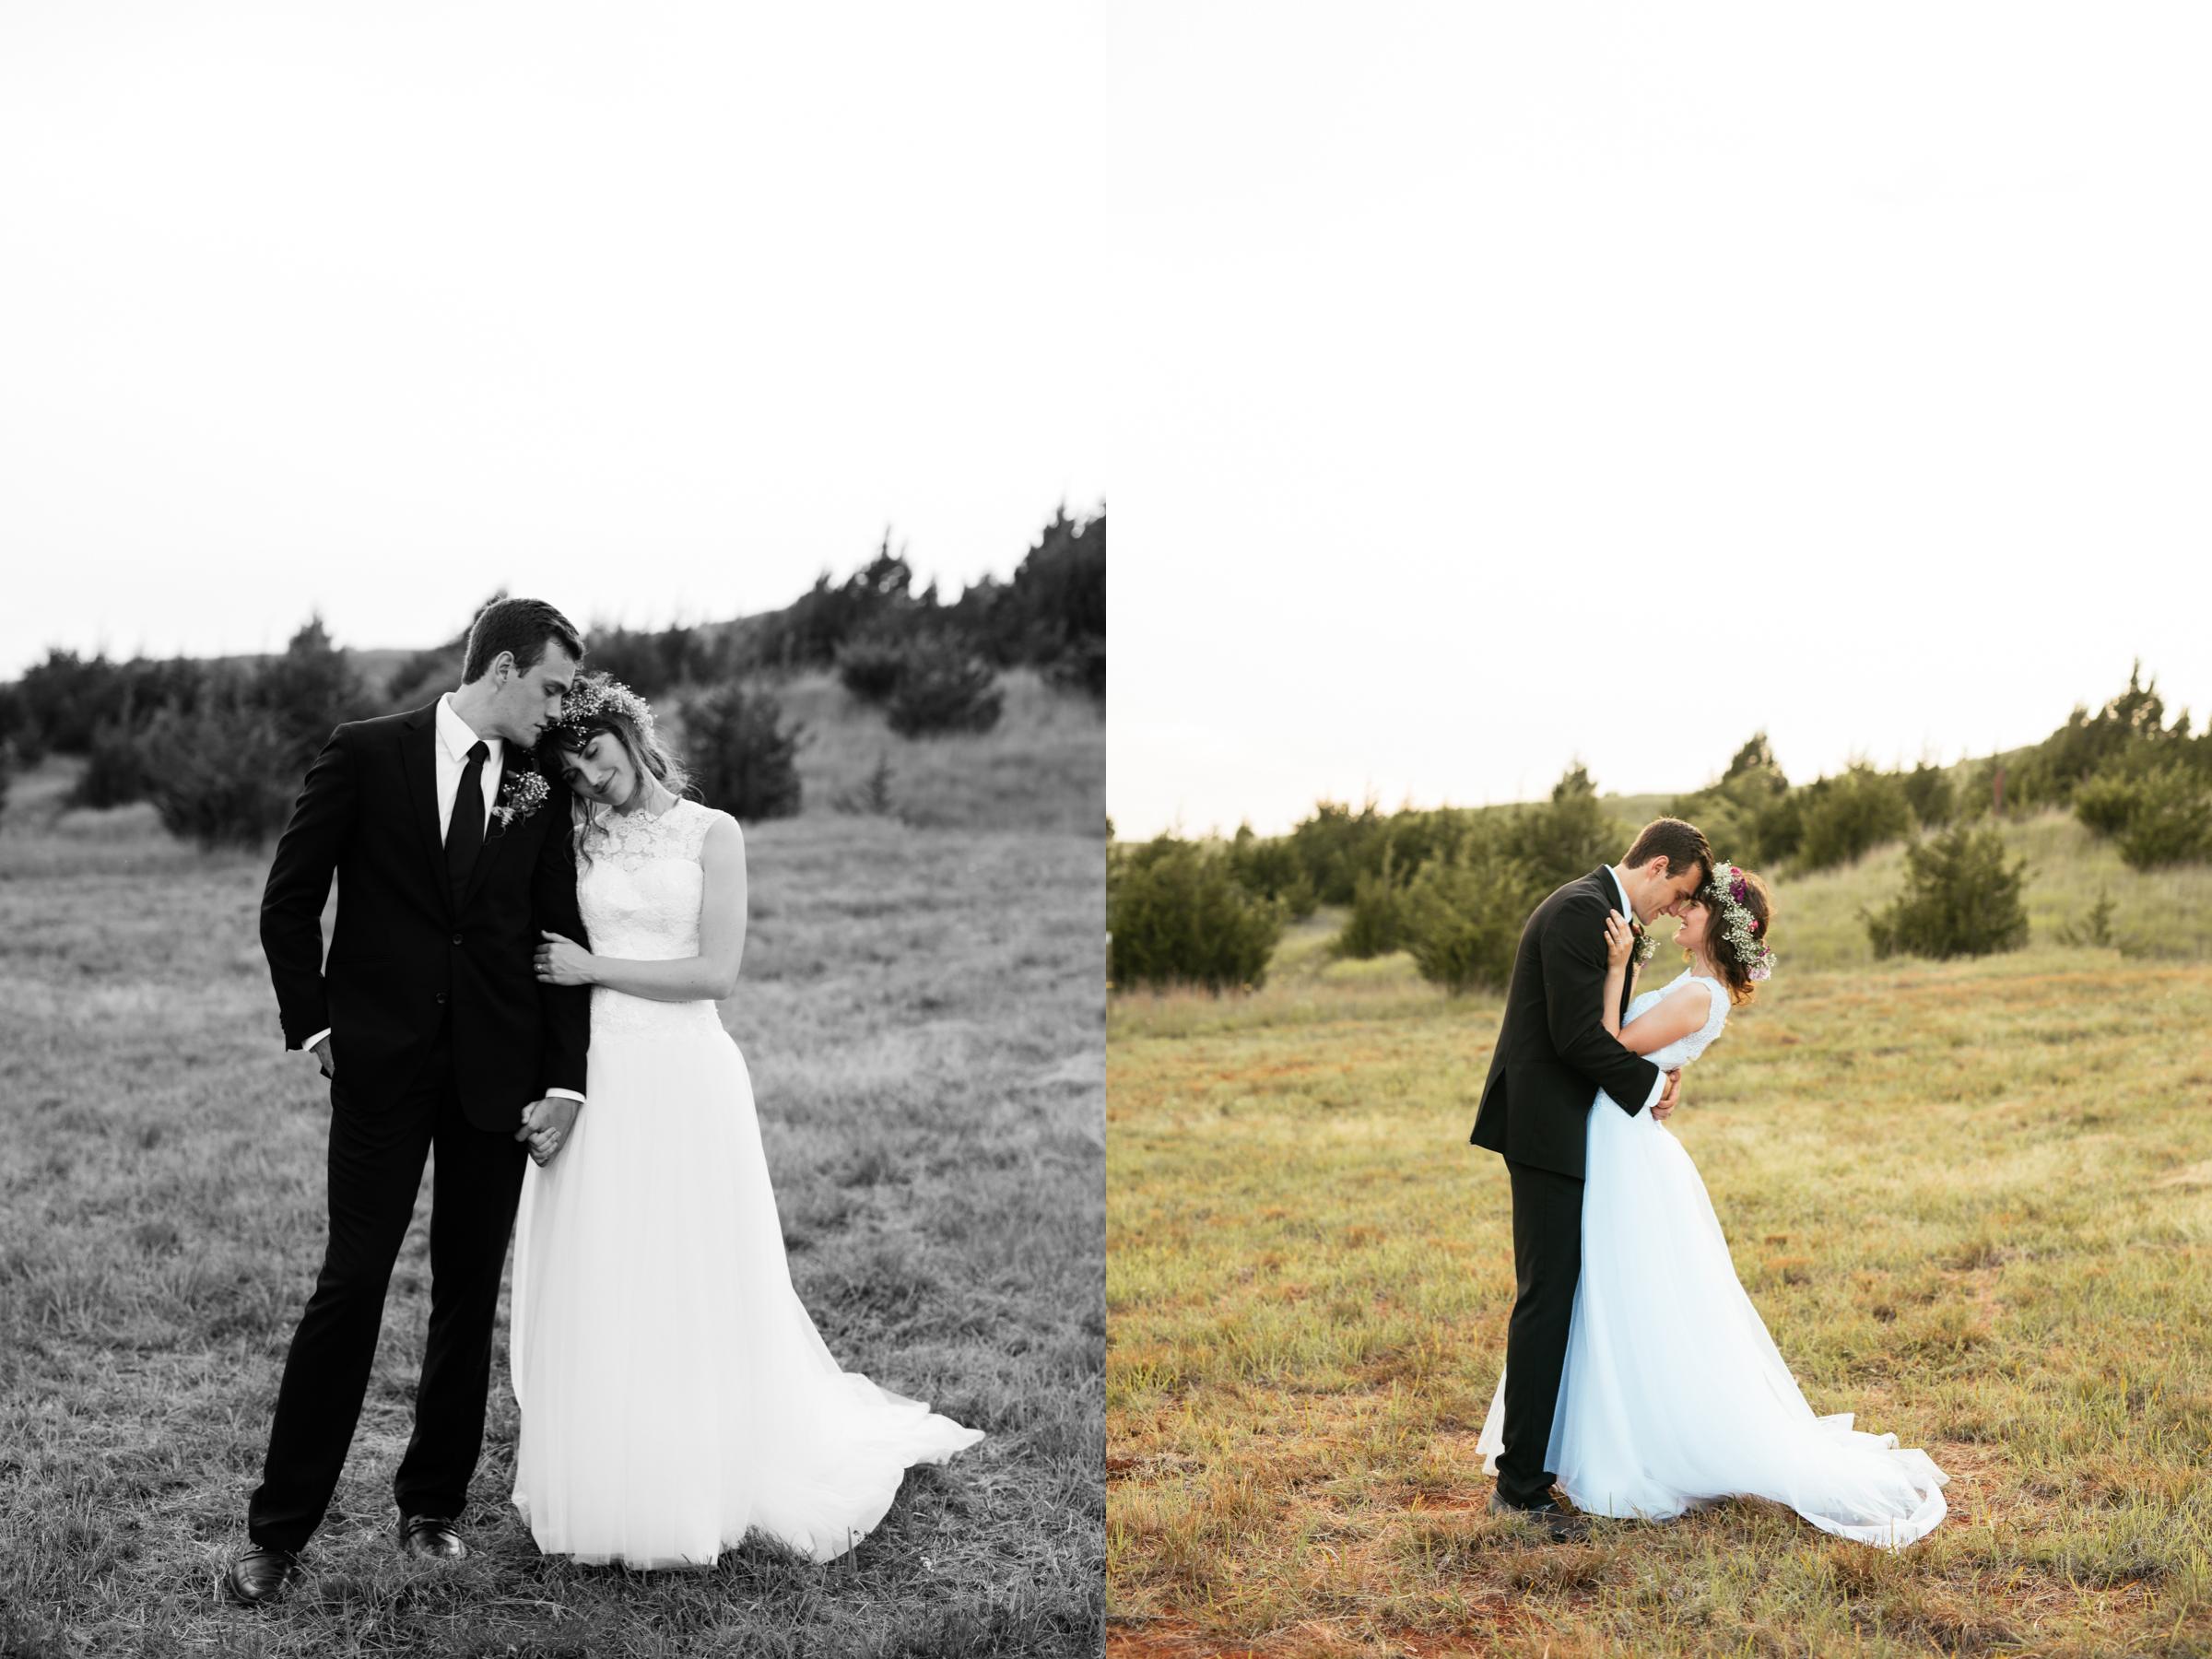 McCurrach Wedding13.jpg